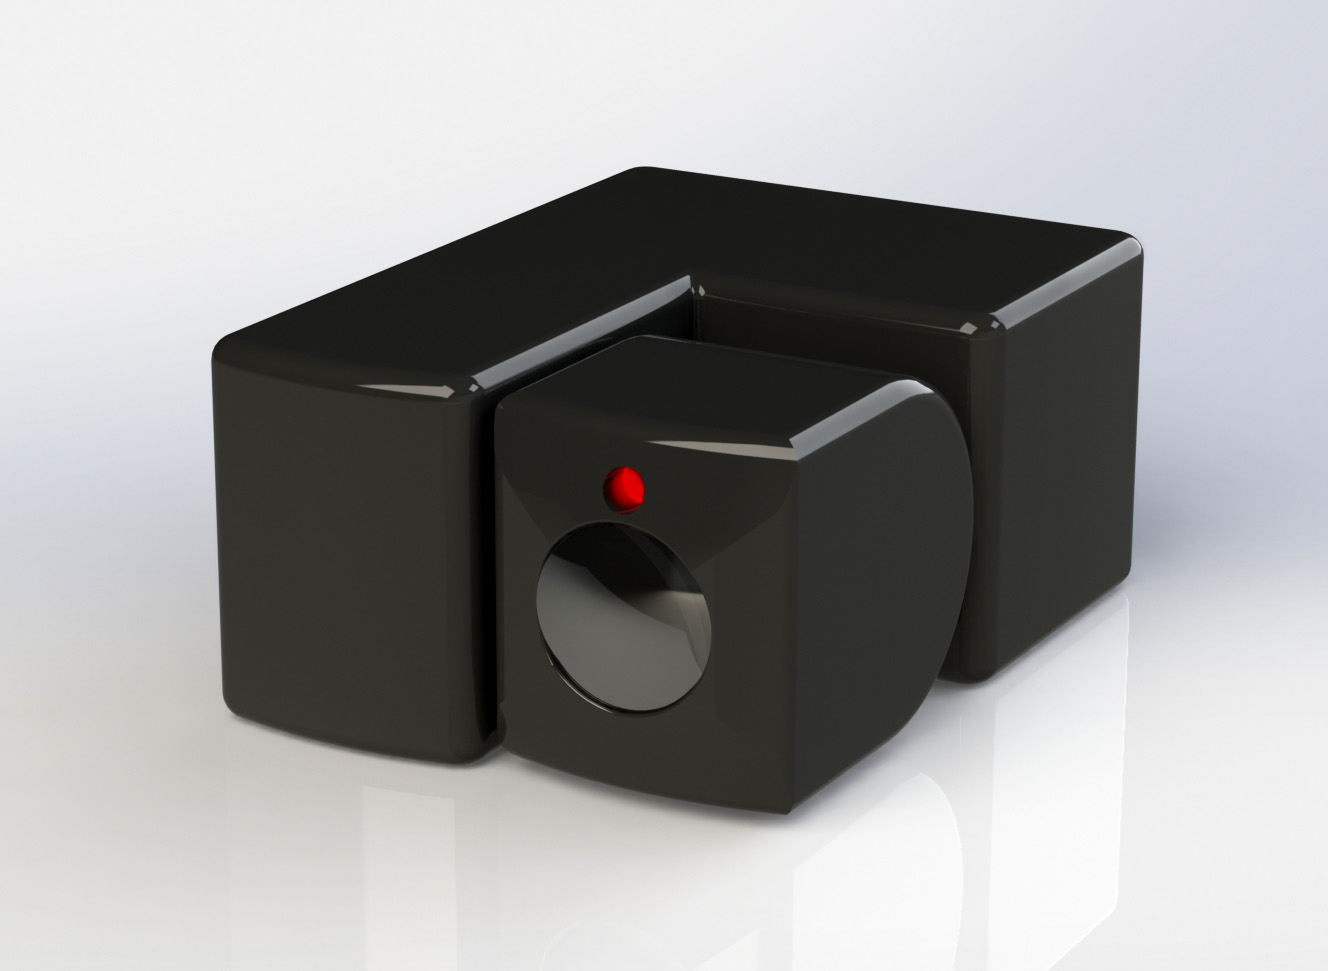 Рисунок 7. 3Д модель счетчика.